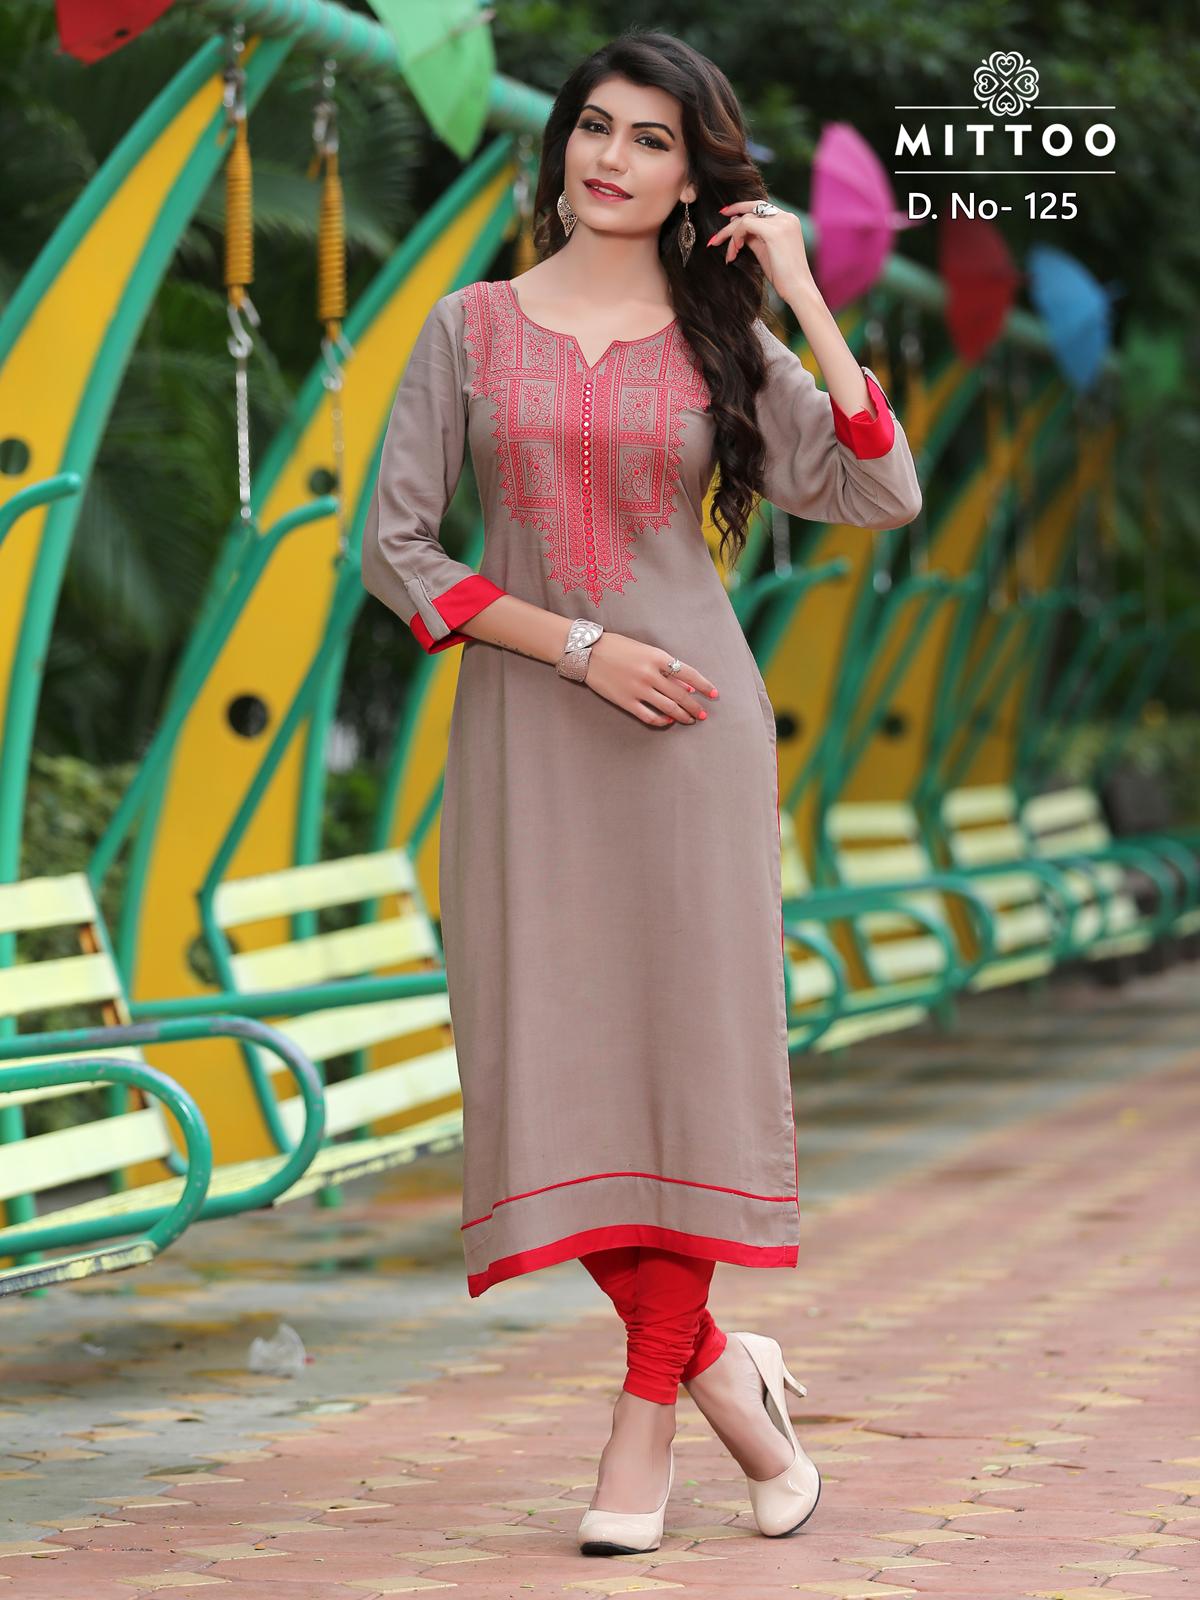 Mittoo : PAYAL-New Arrival Designer 14 Kg Rayon Kurti